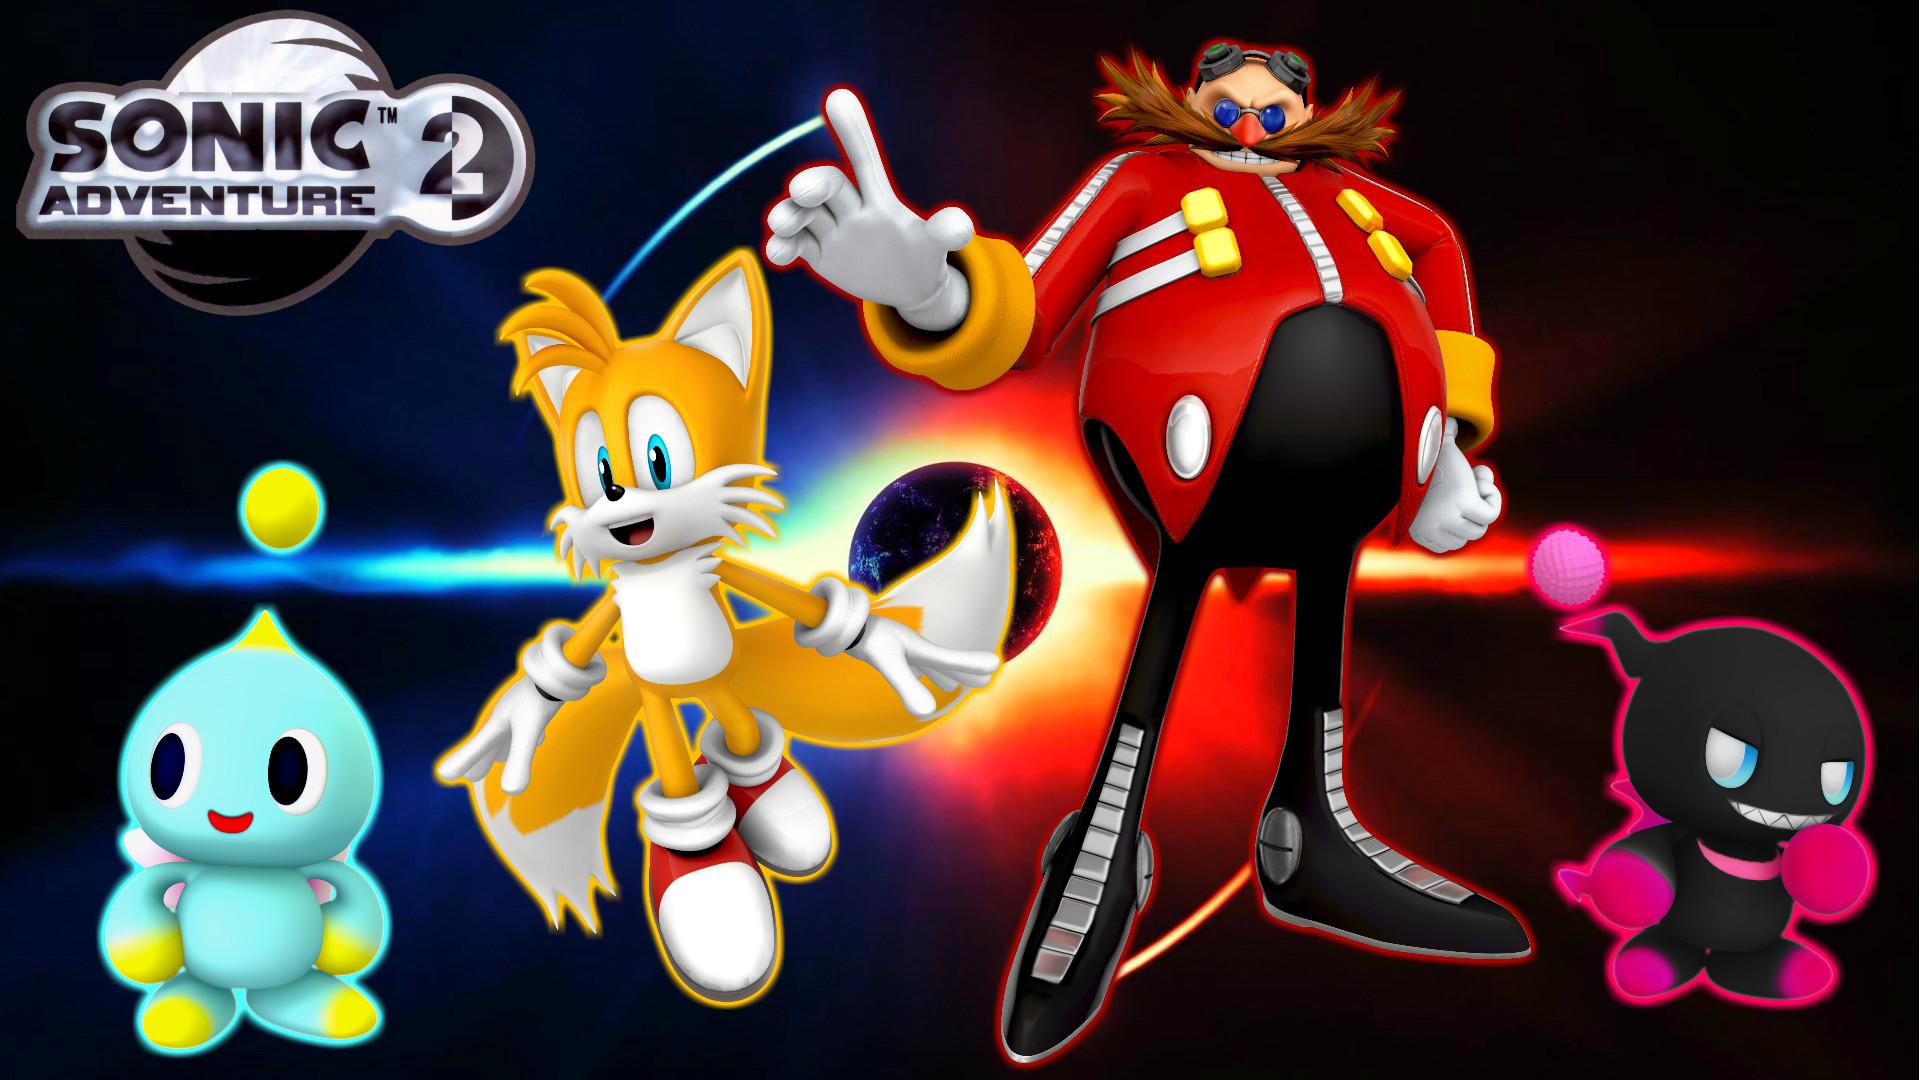 Sonic Adventure 2 Battle Wallpaper